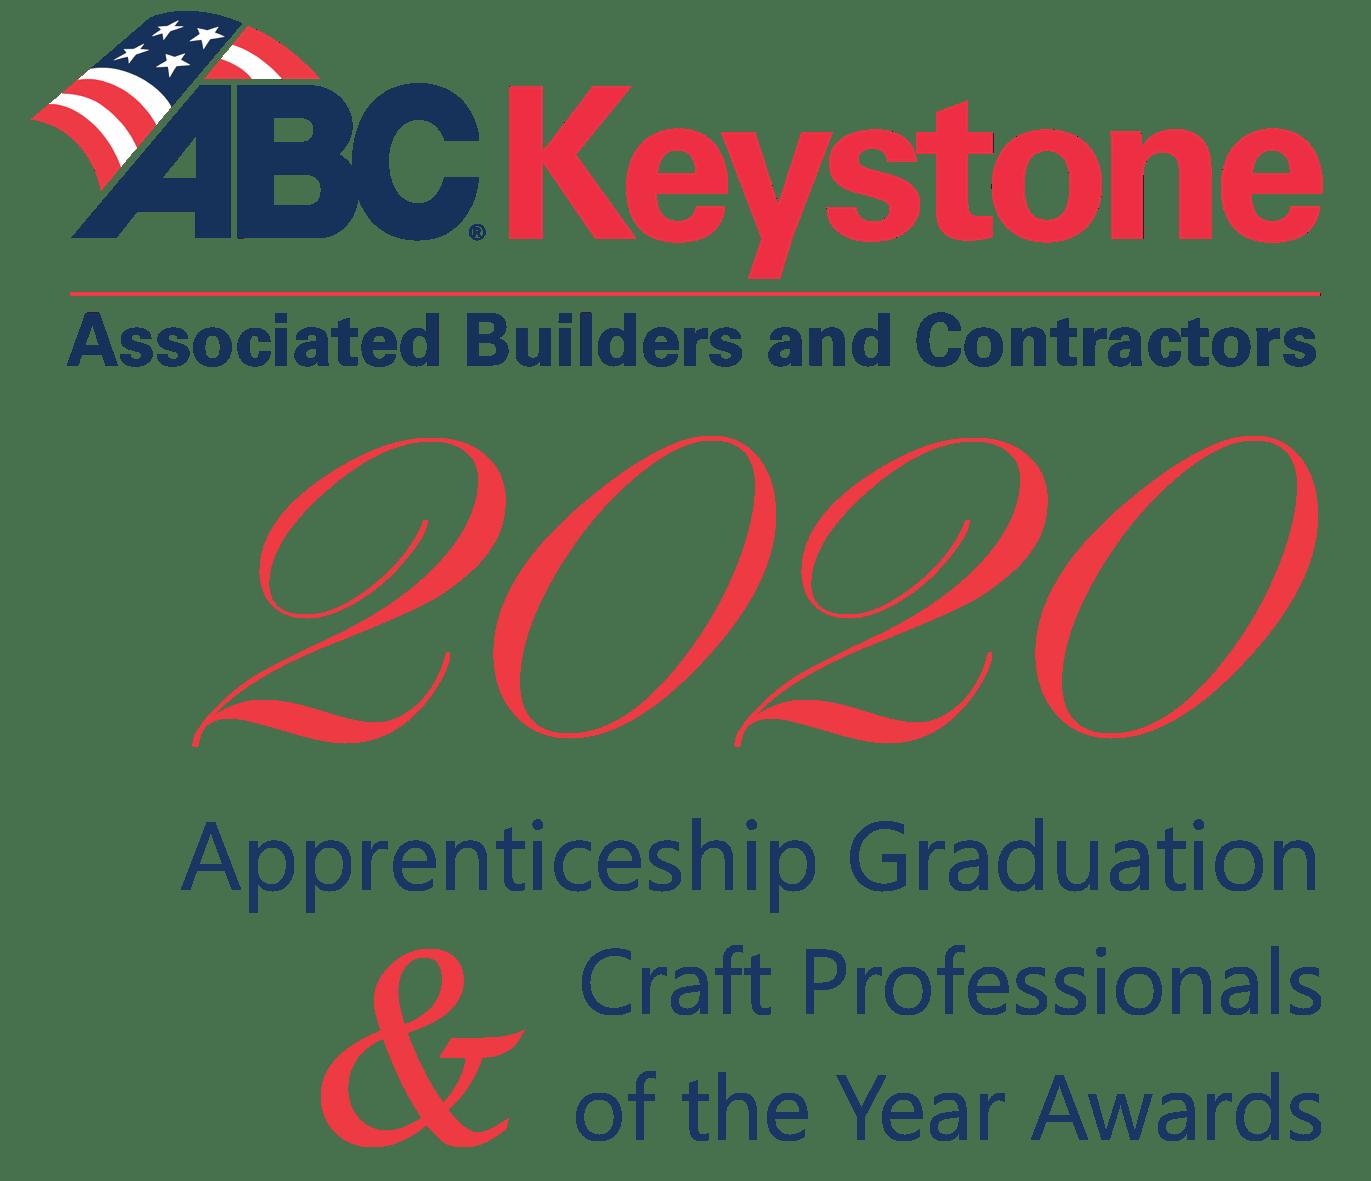 2020 ABC Keystone Apprenticeship Graduation